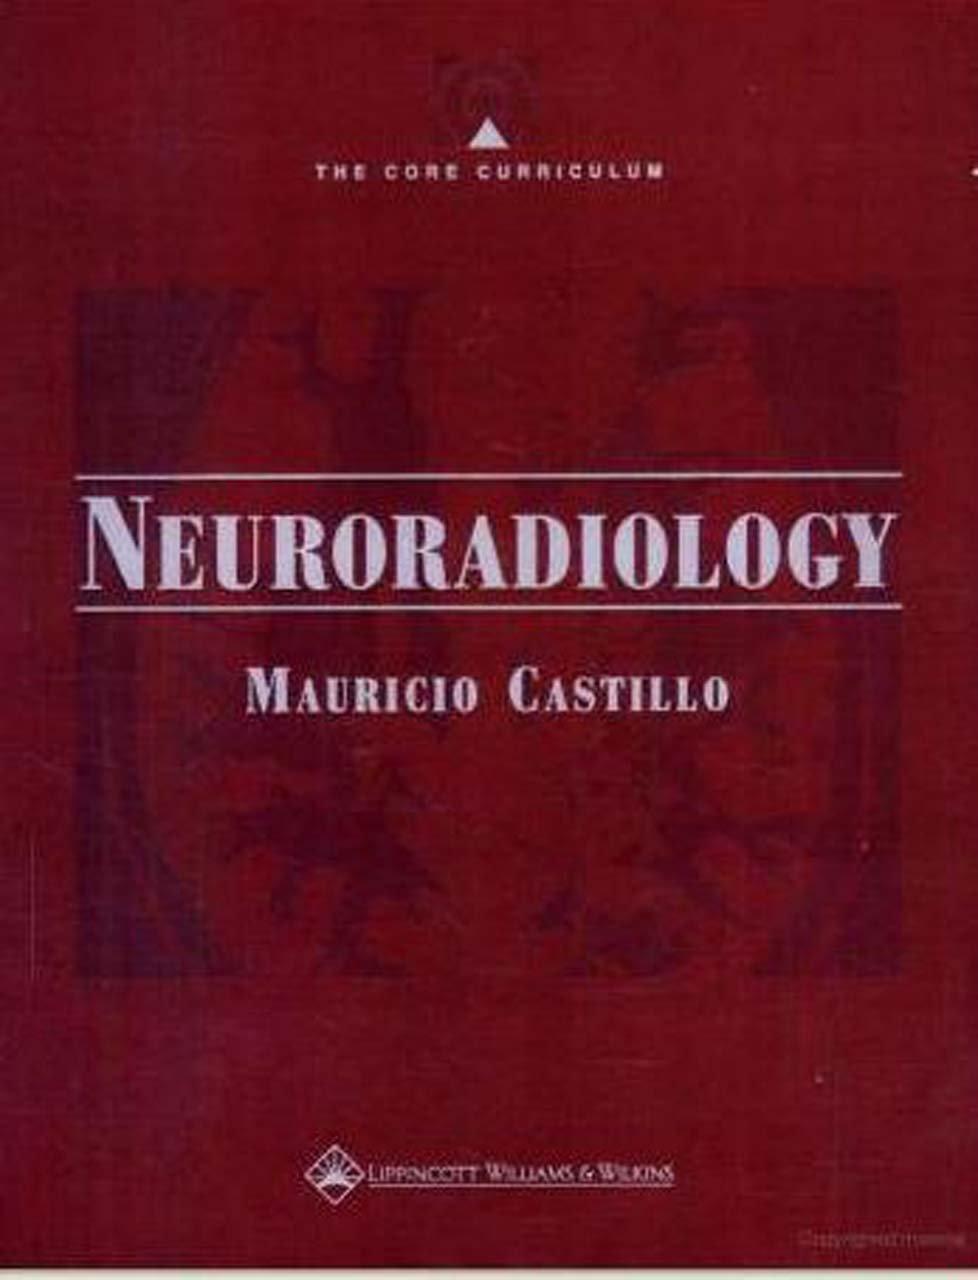 The Core Curriculum: Neuroradiology Mauricio Castillo